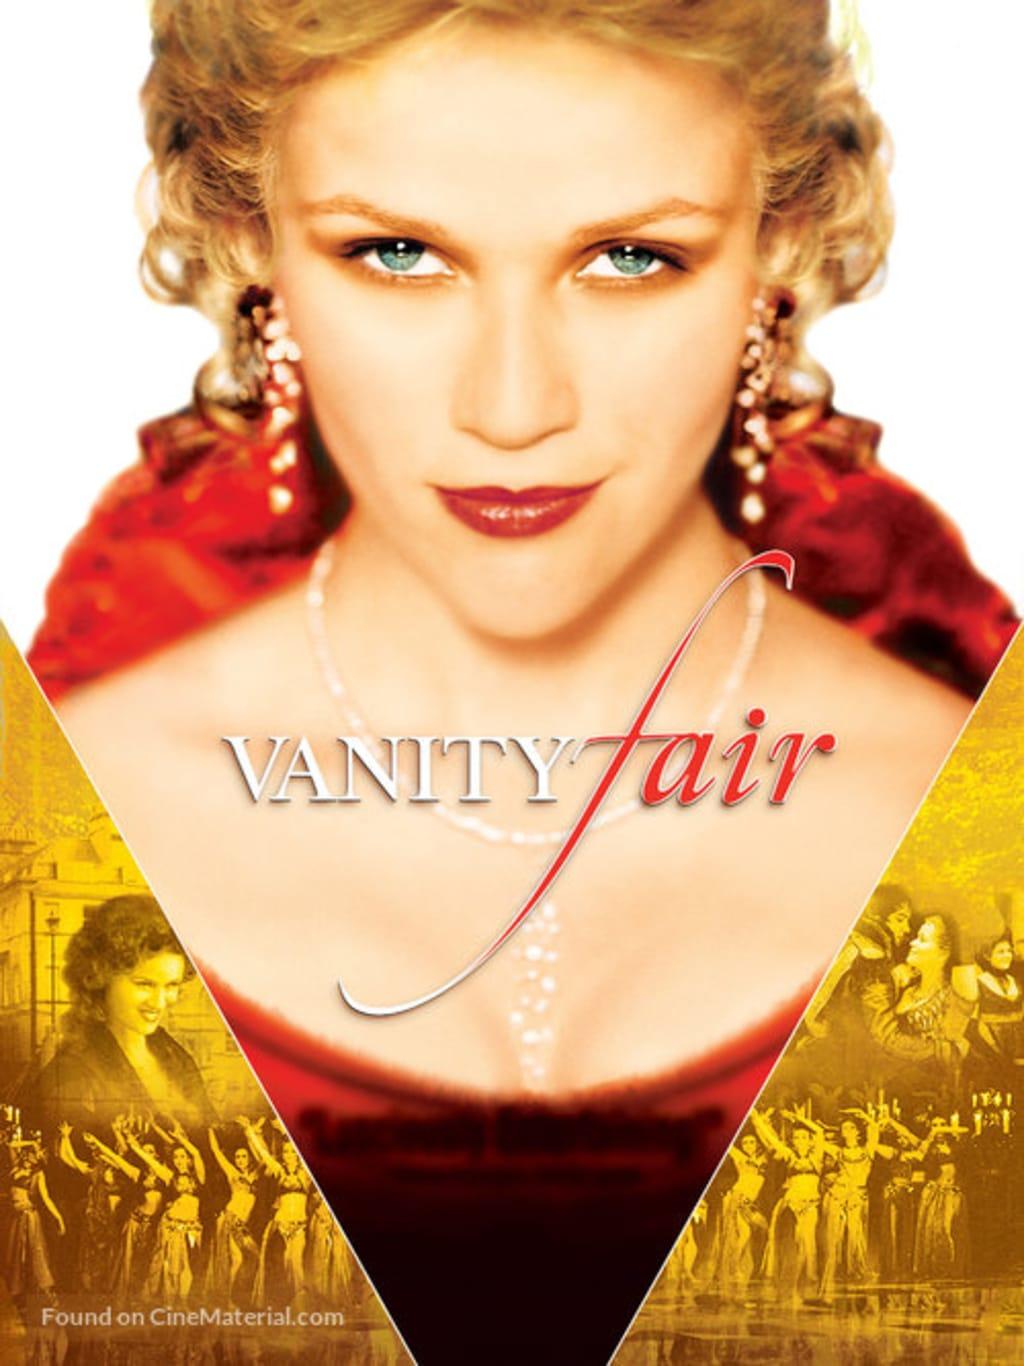 Reading Journal: 'Vanity Fair'